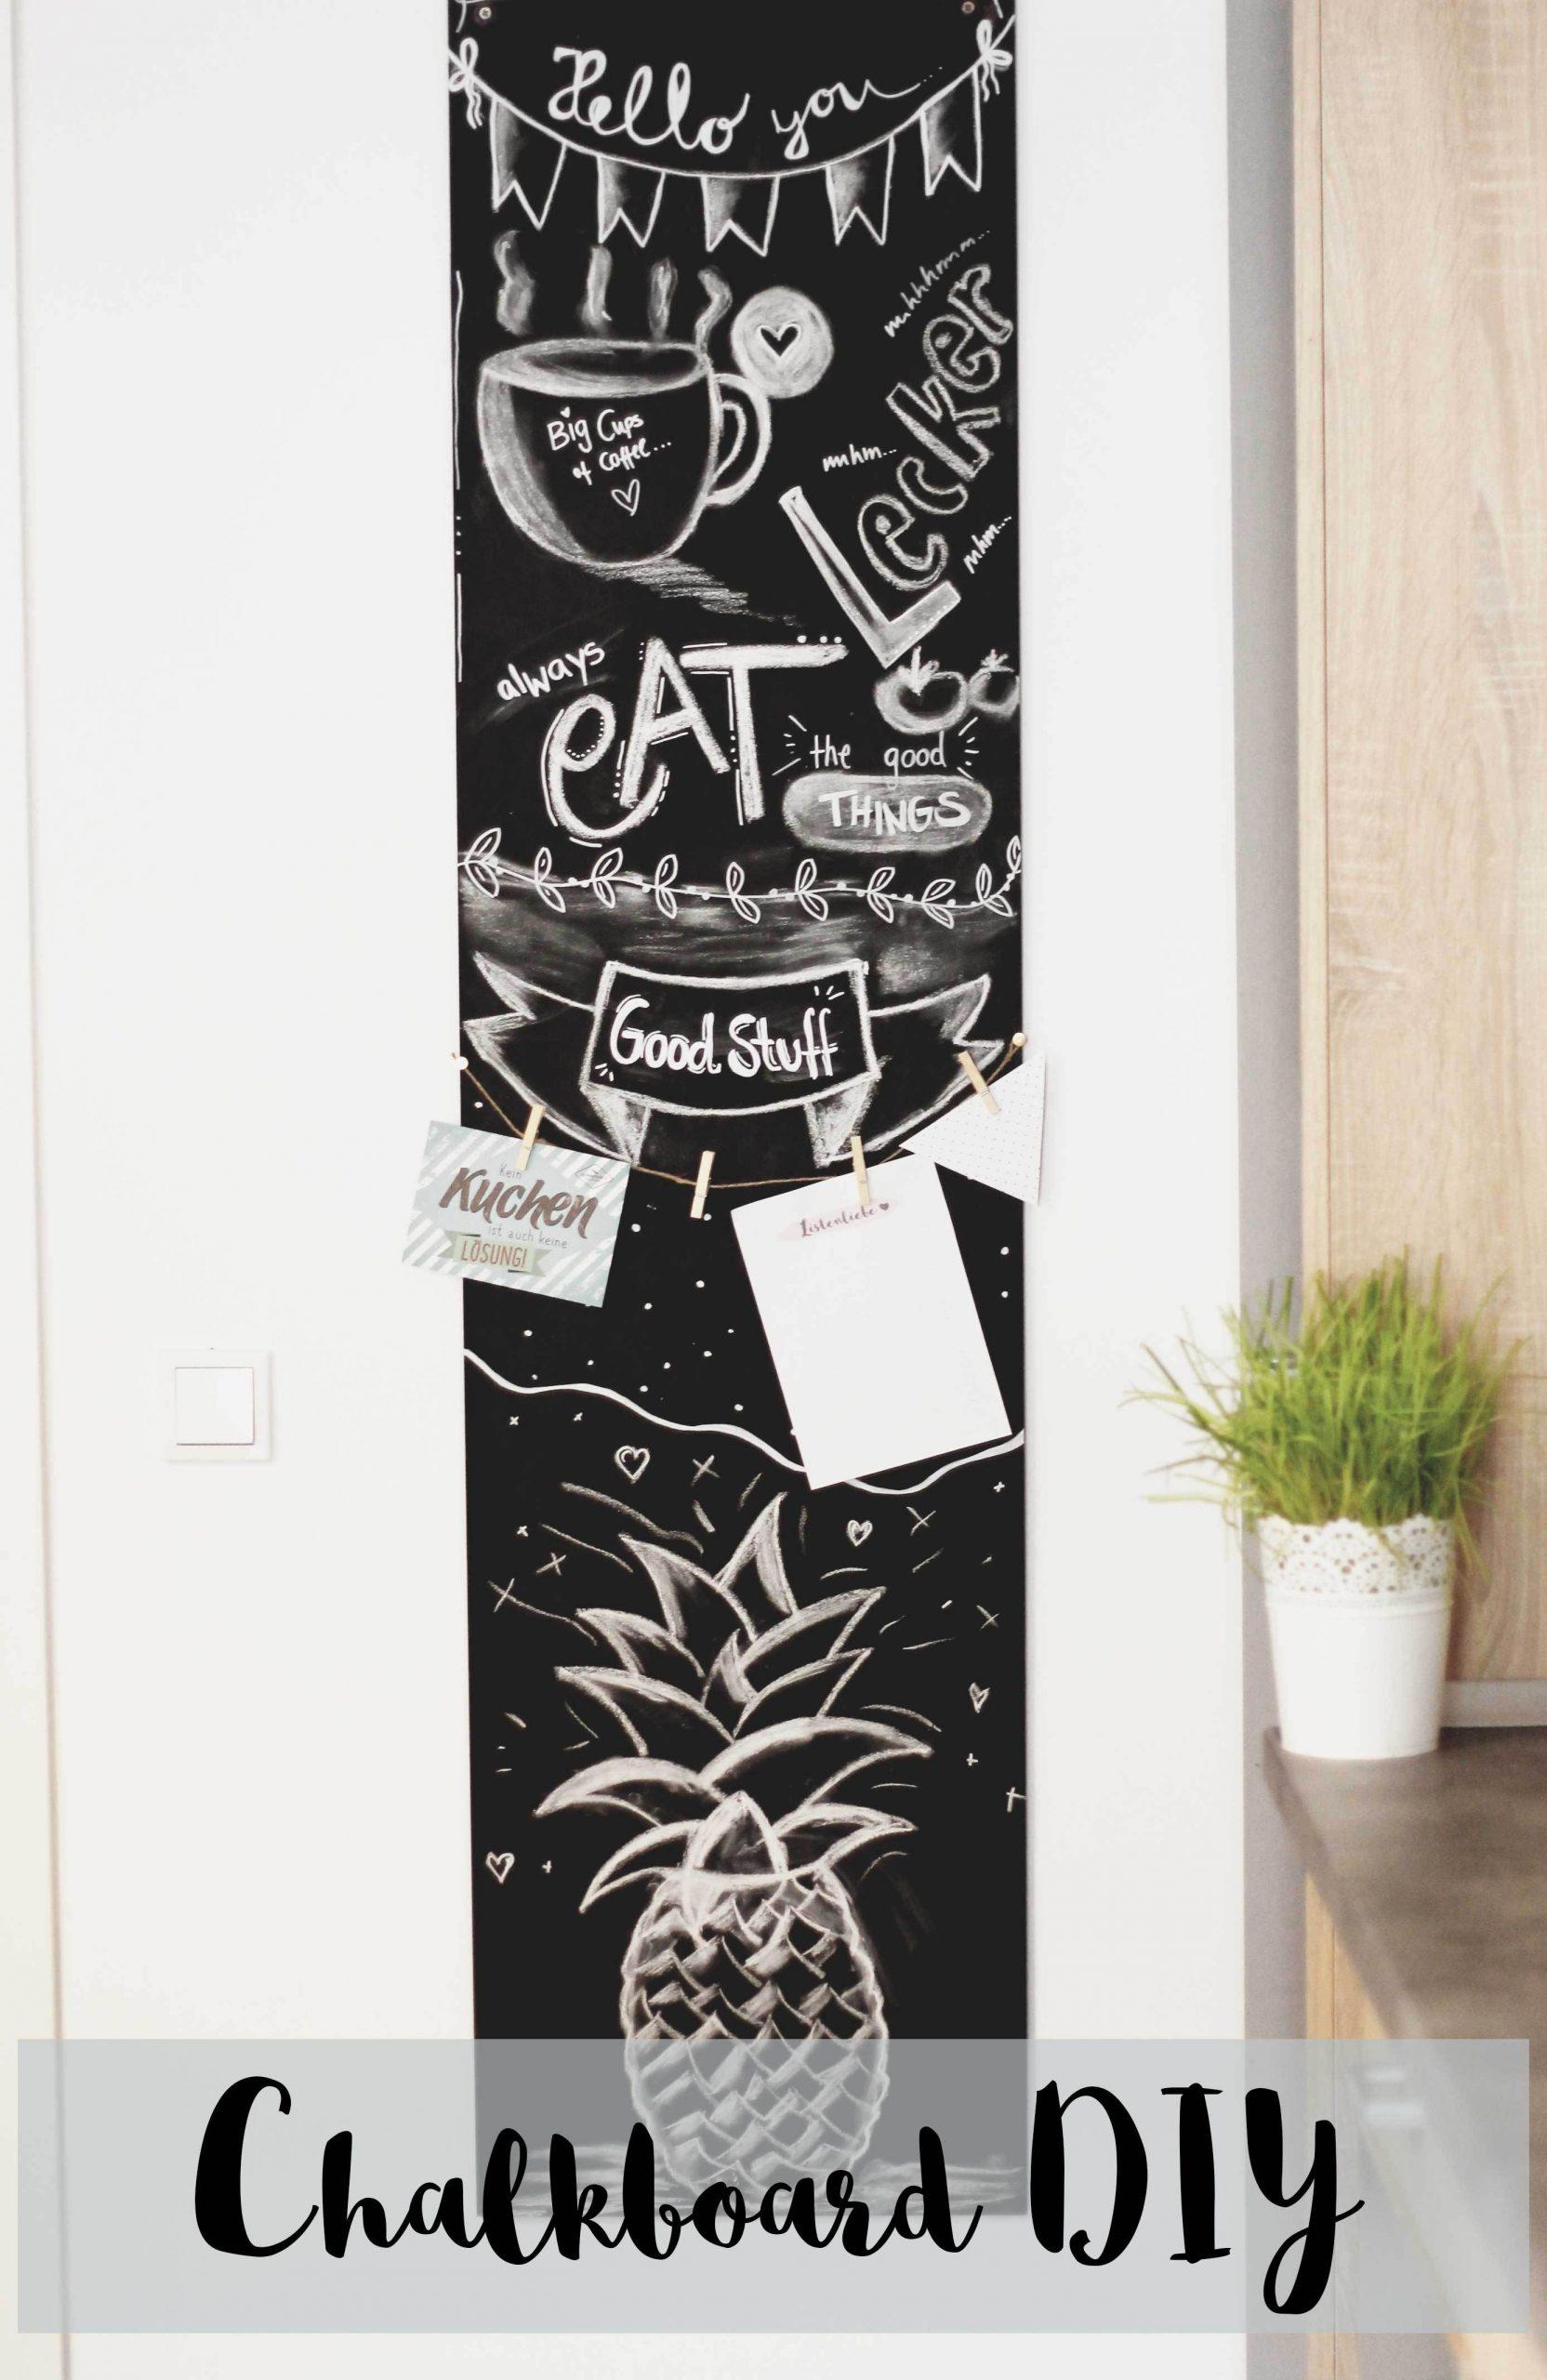 Full Size of Kreidetafel Küche Kaufen Kreidetafel Küche Wand Kreidetafel Küche Selber Machen Küche Mit Kreidetafel Küche Kreidetafel Küche